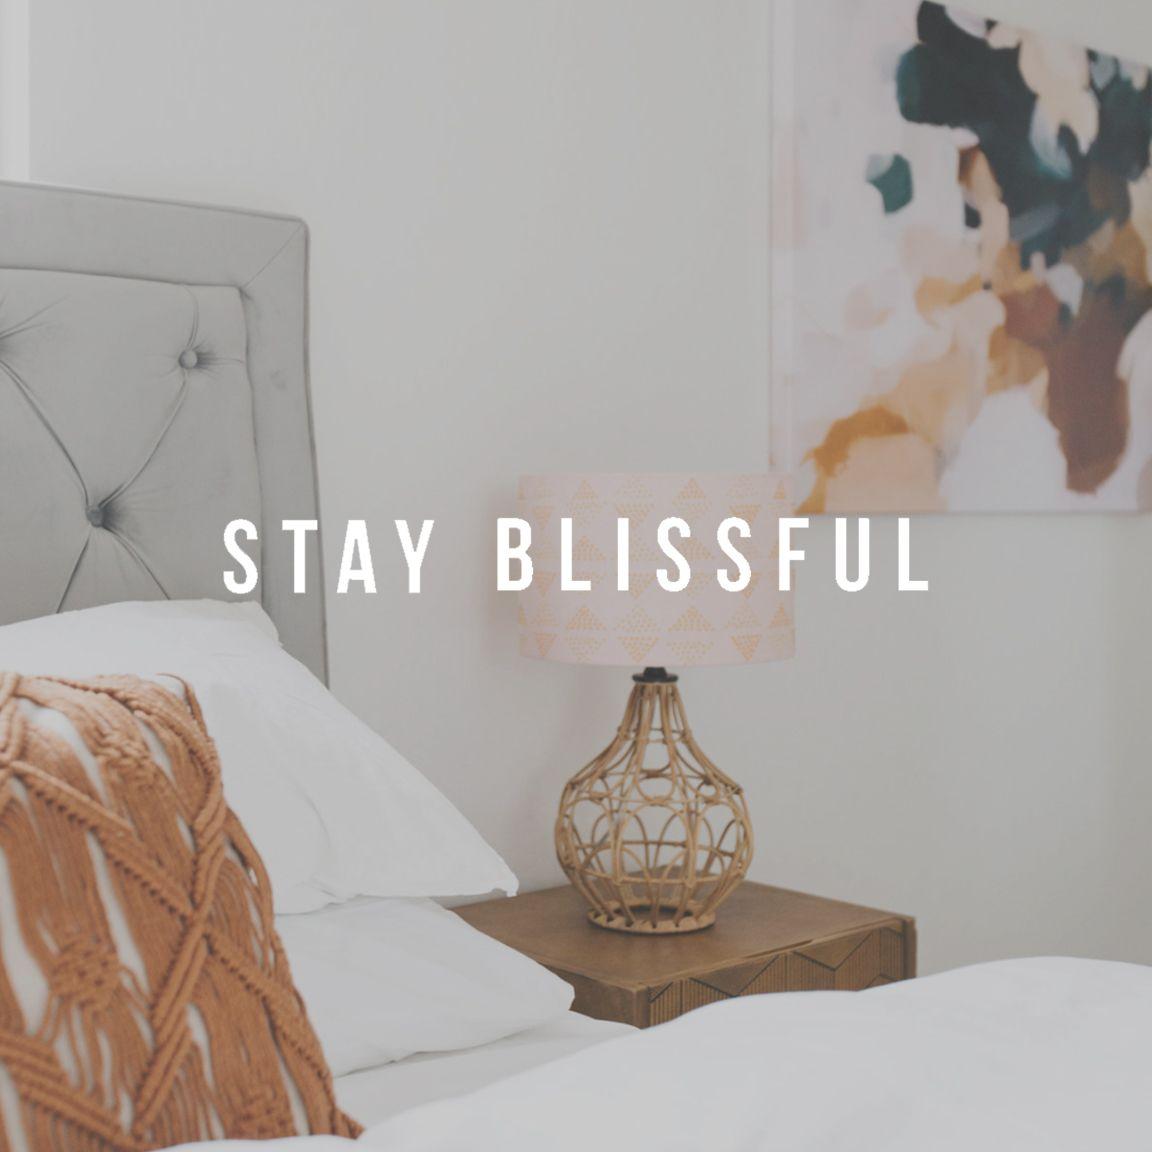 Elizabeth McCravy Showit Website Template Shop - Stay ...